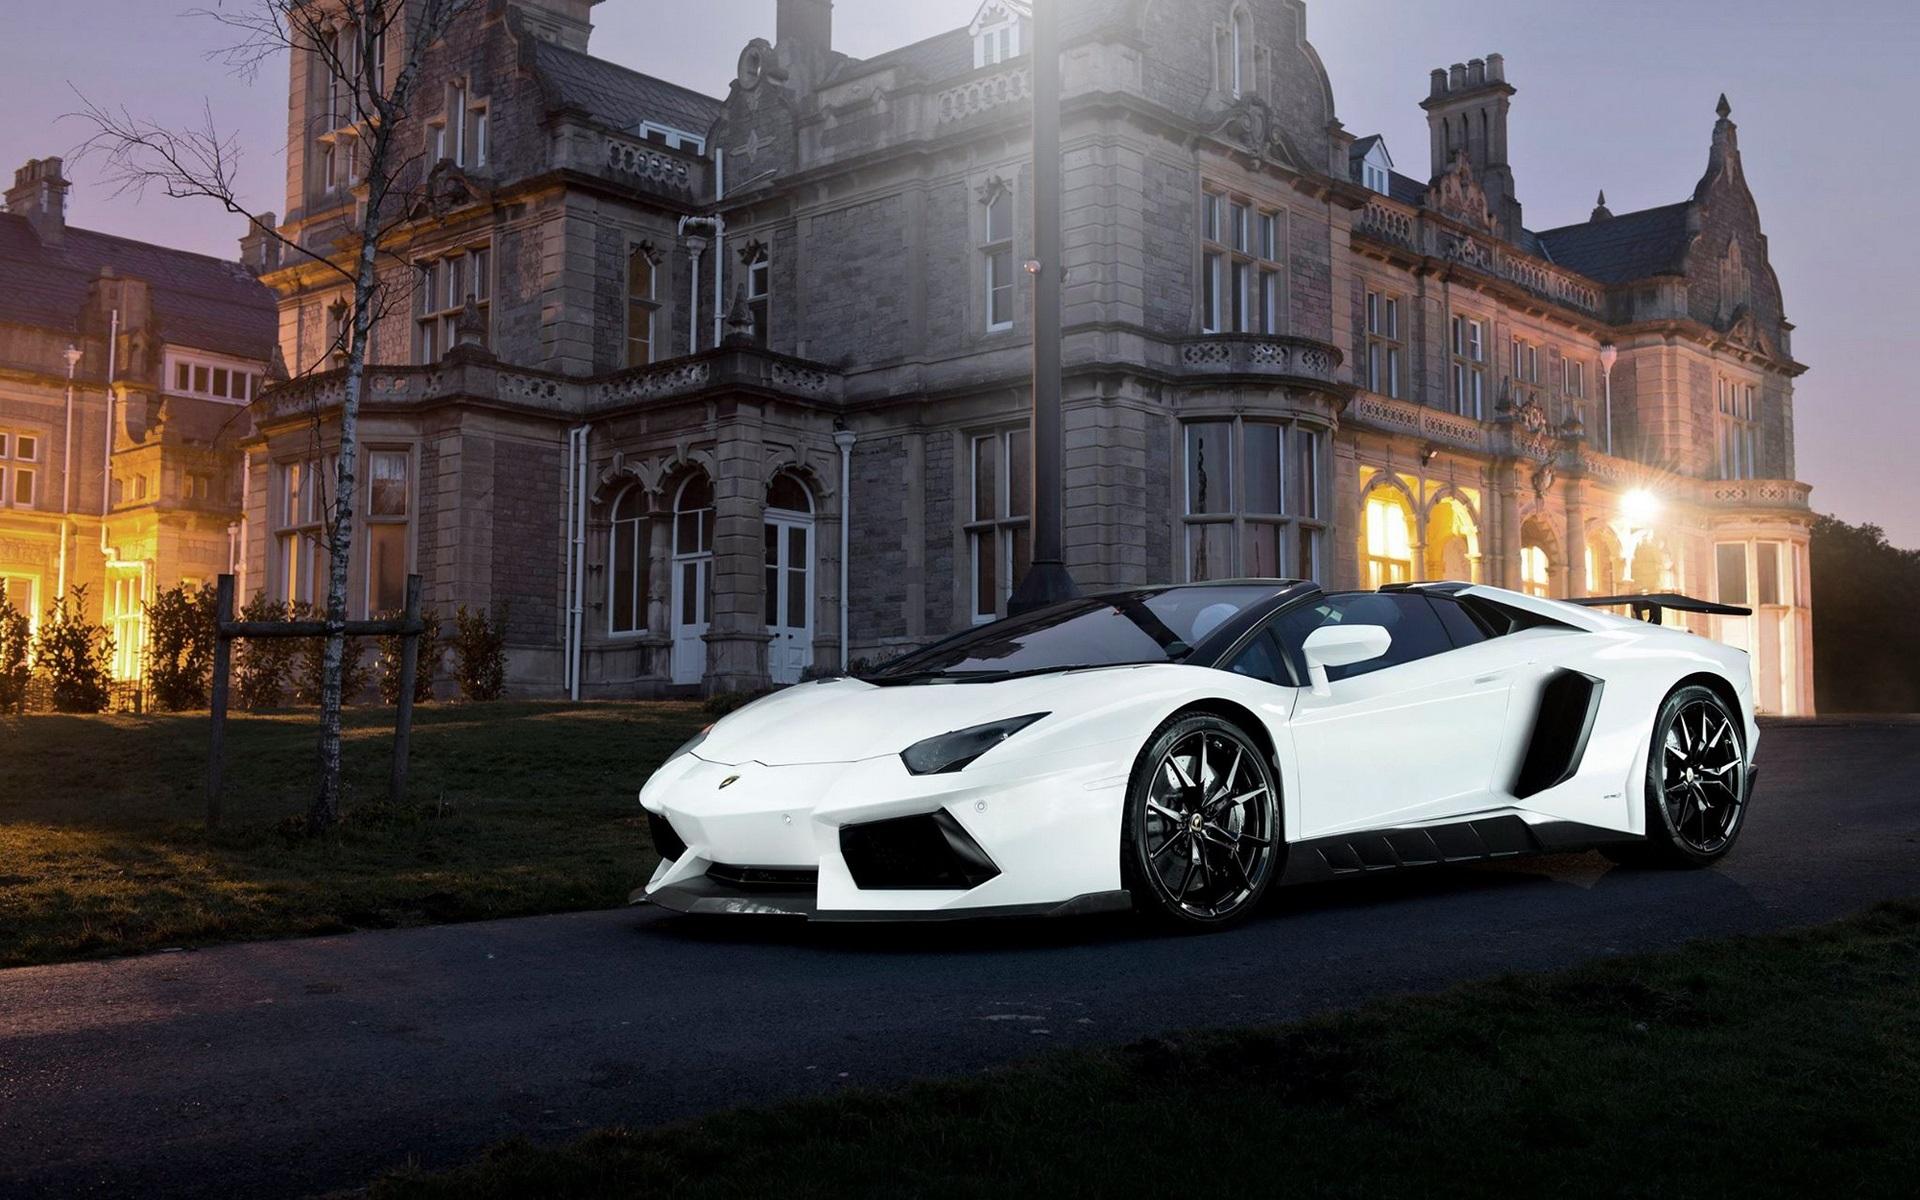 1080p Muscle Car Wallpaper Lamborghini Aventador White Supercar Night House Lights